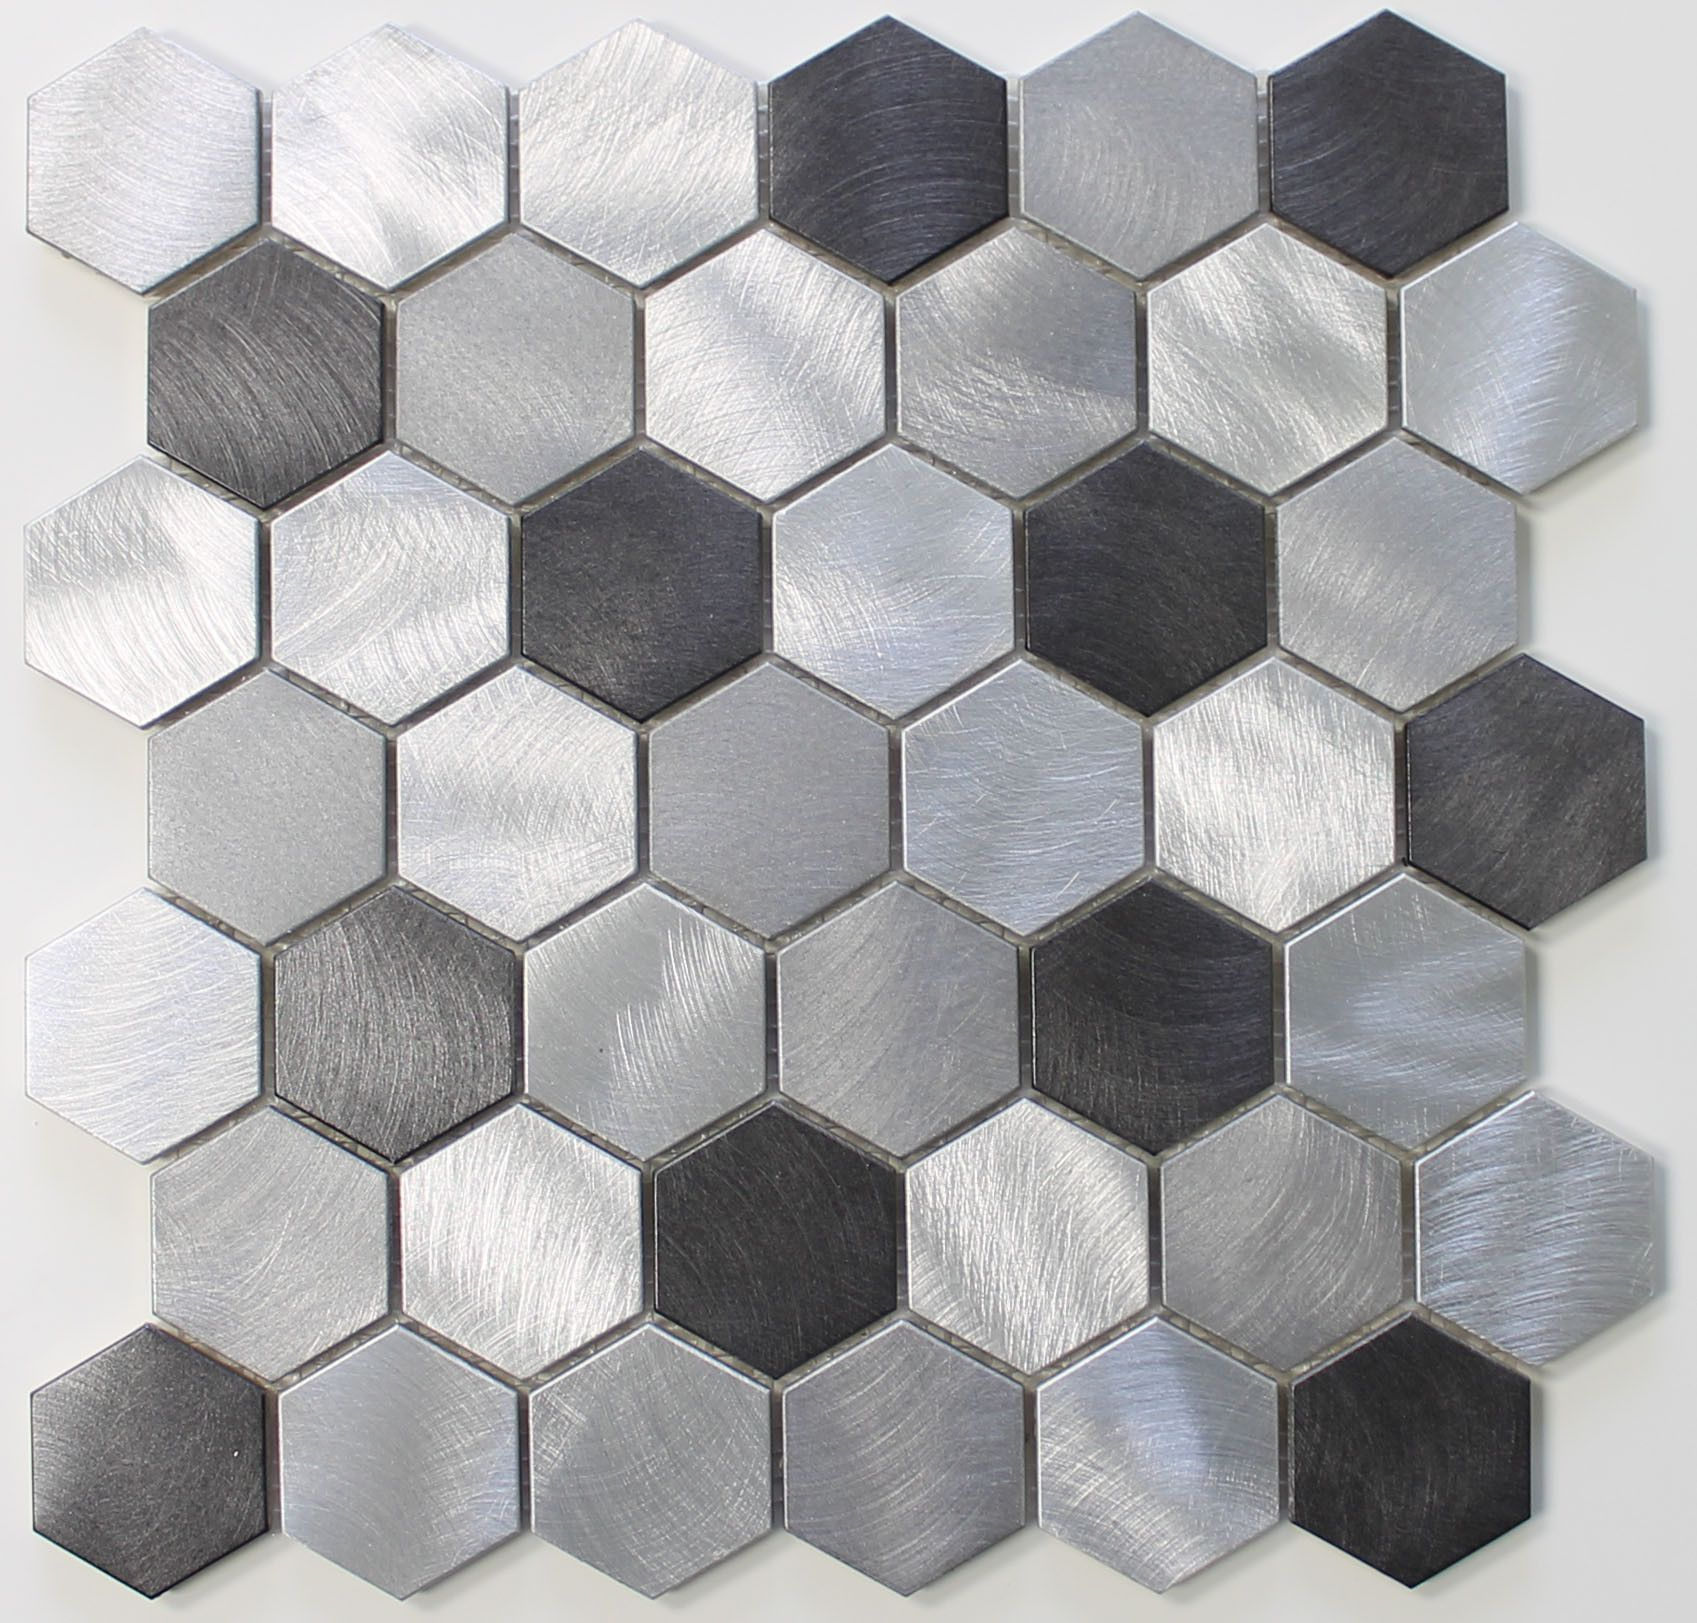 Uptown brushed aluminum 2 inch hexagon mosaic tiles hexagon uptown brushed aluminum 2 inch hexagon mosaic tiles dailygadgetfo Choice Image